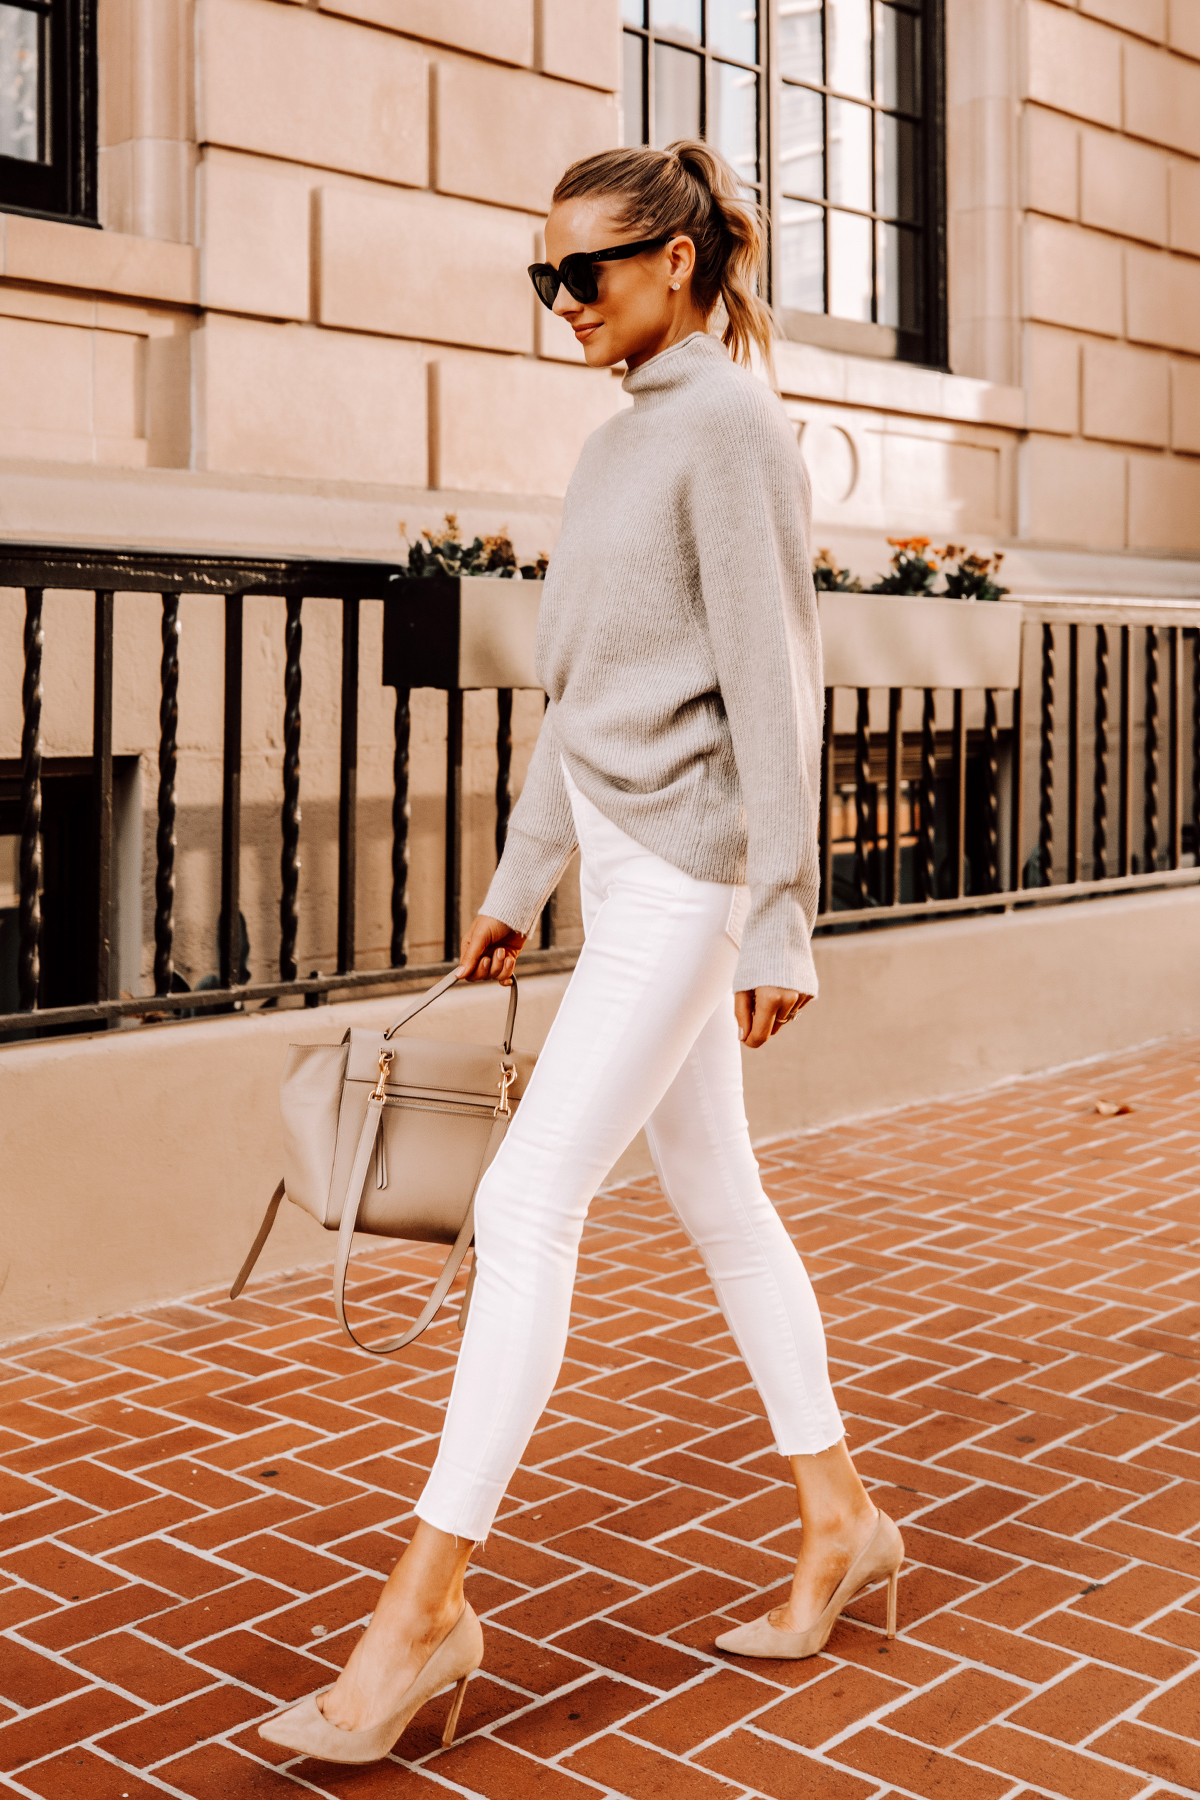 Fashion Jackson Wearing Beige Mockneck Sweater White Skinny Jeans Nude Pumps